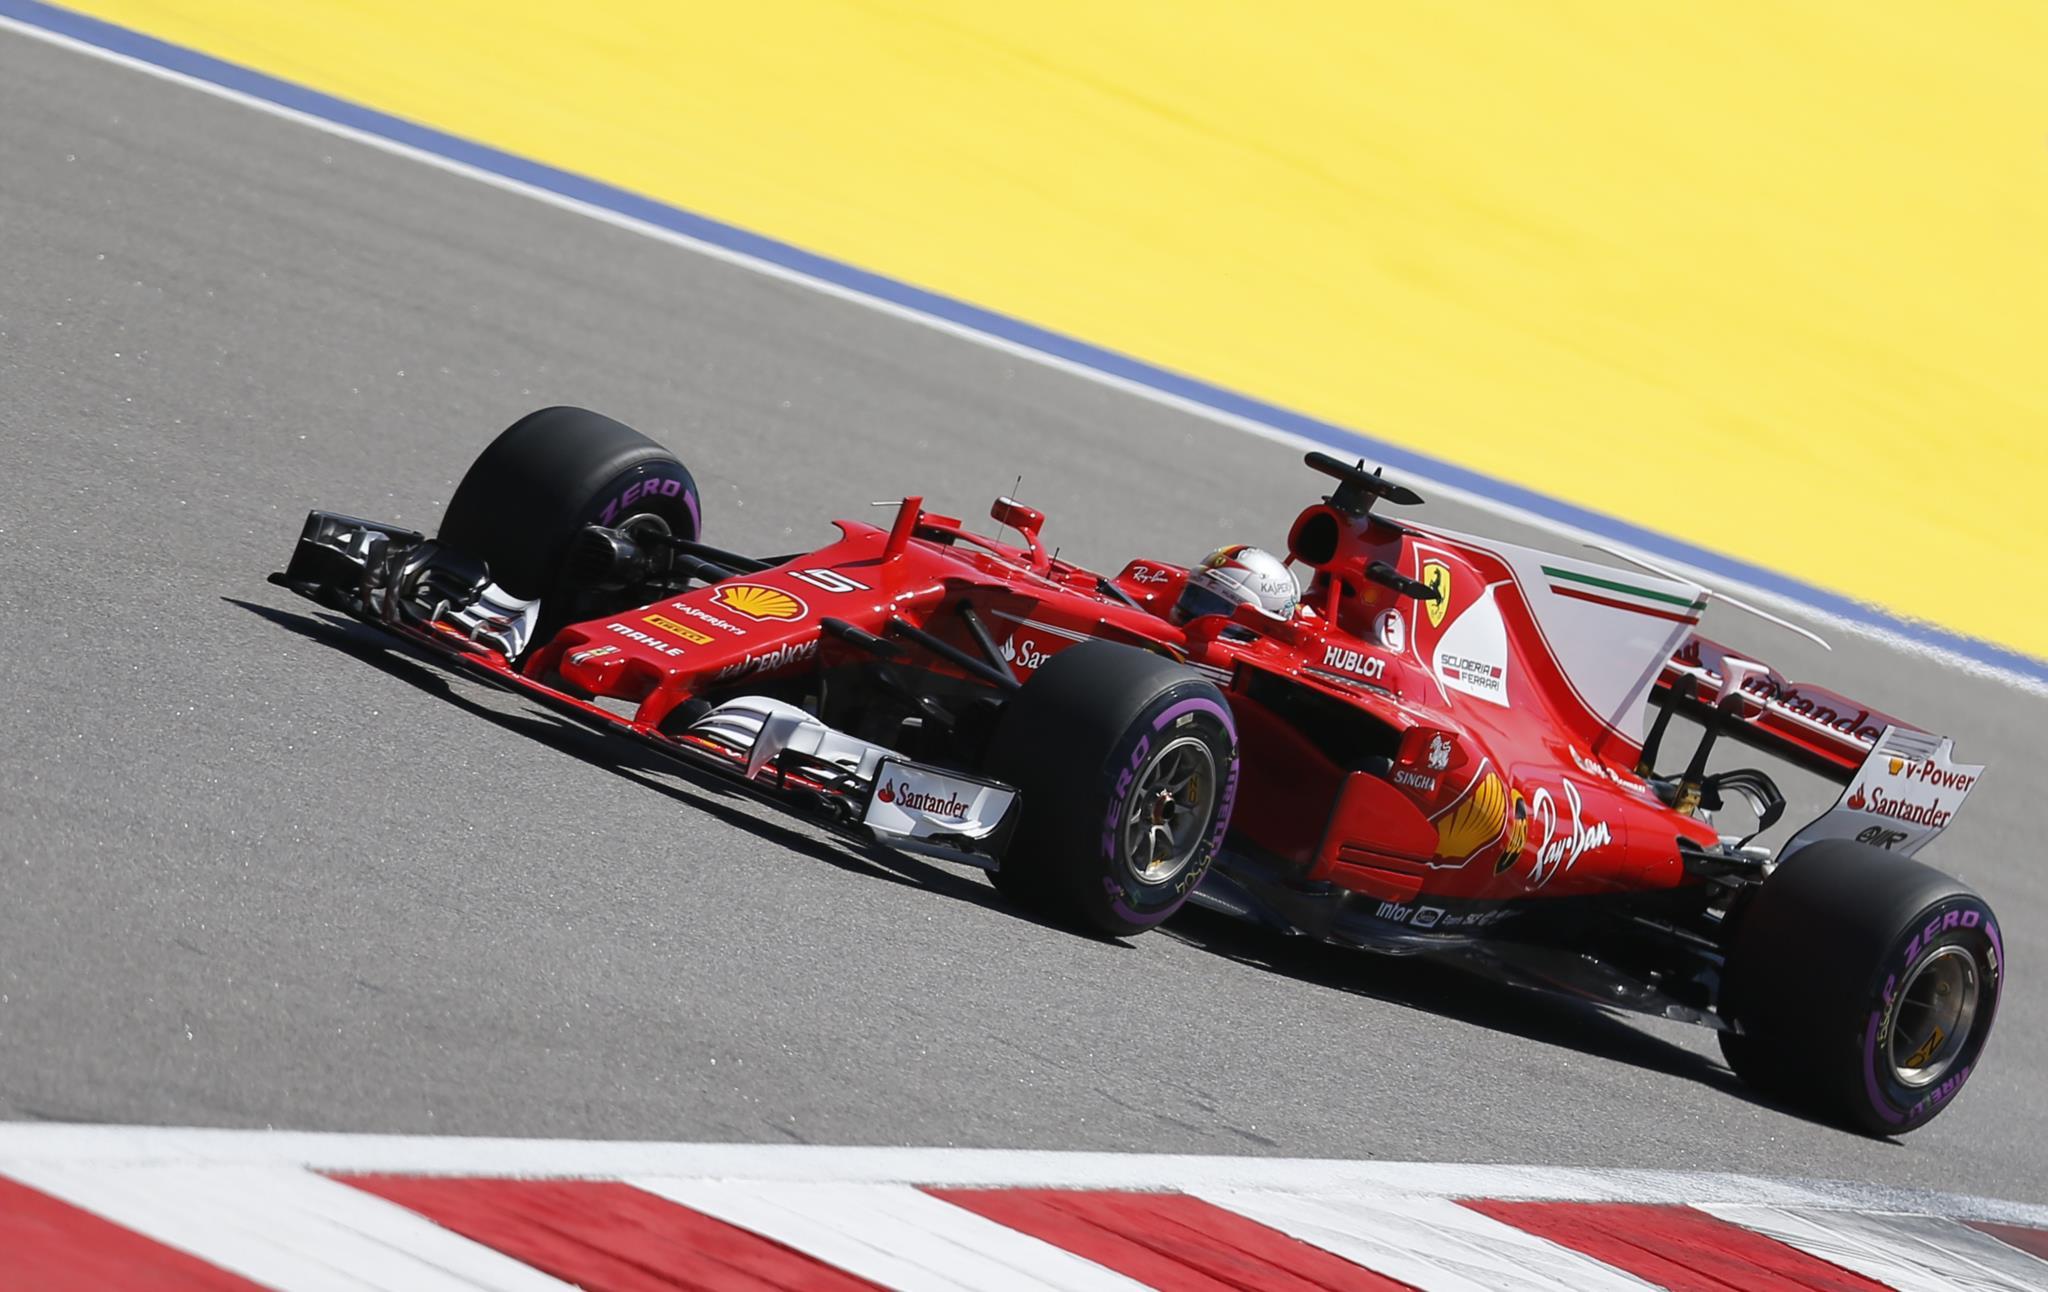 PÚBLICO - Vettel garante <i>pole position</i> em Sochi